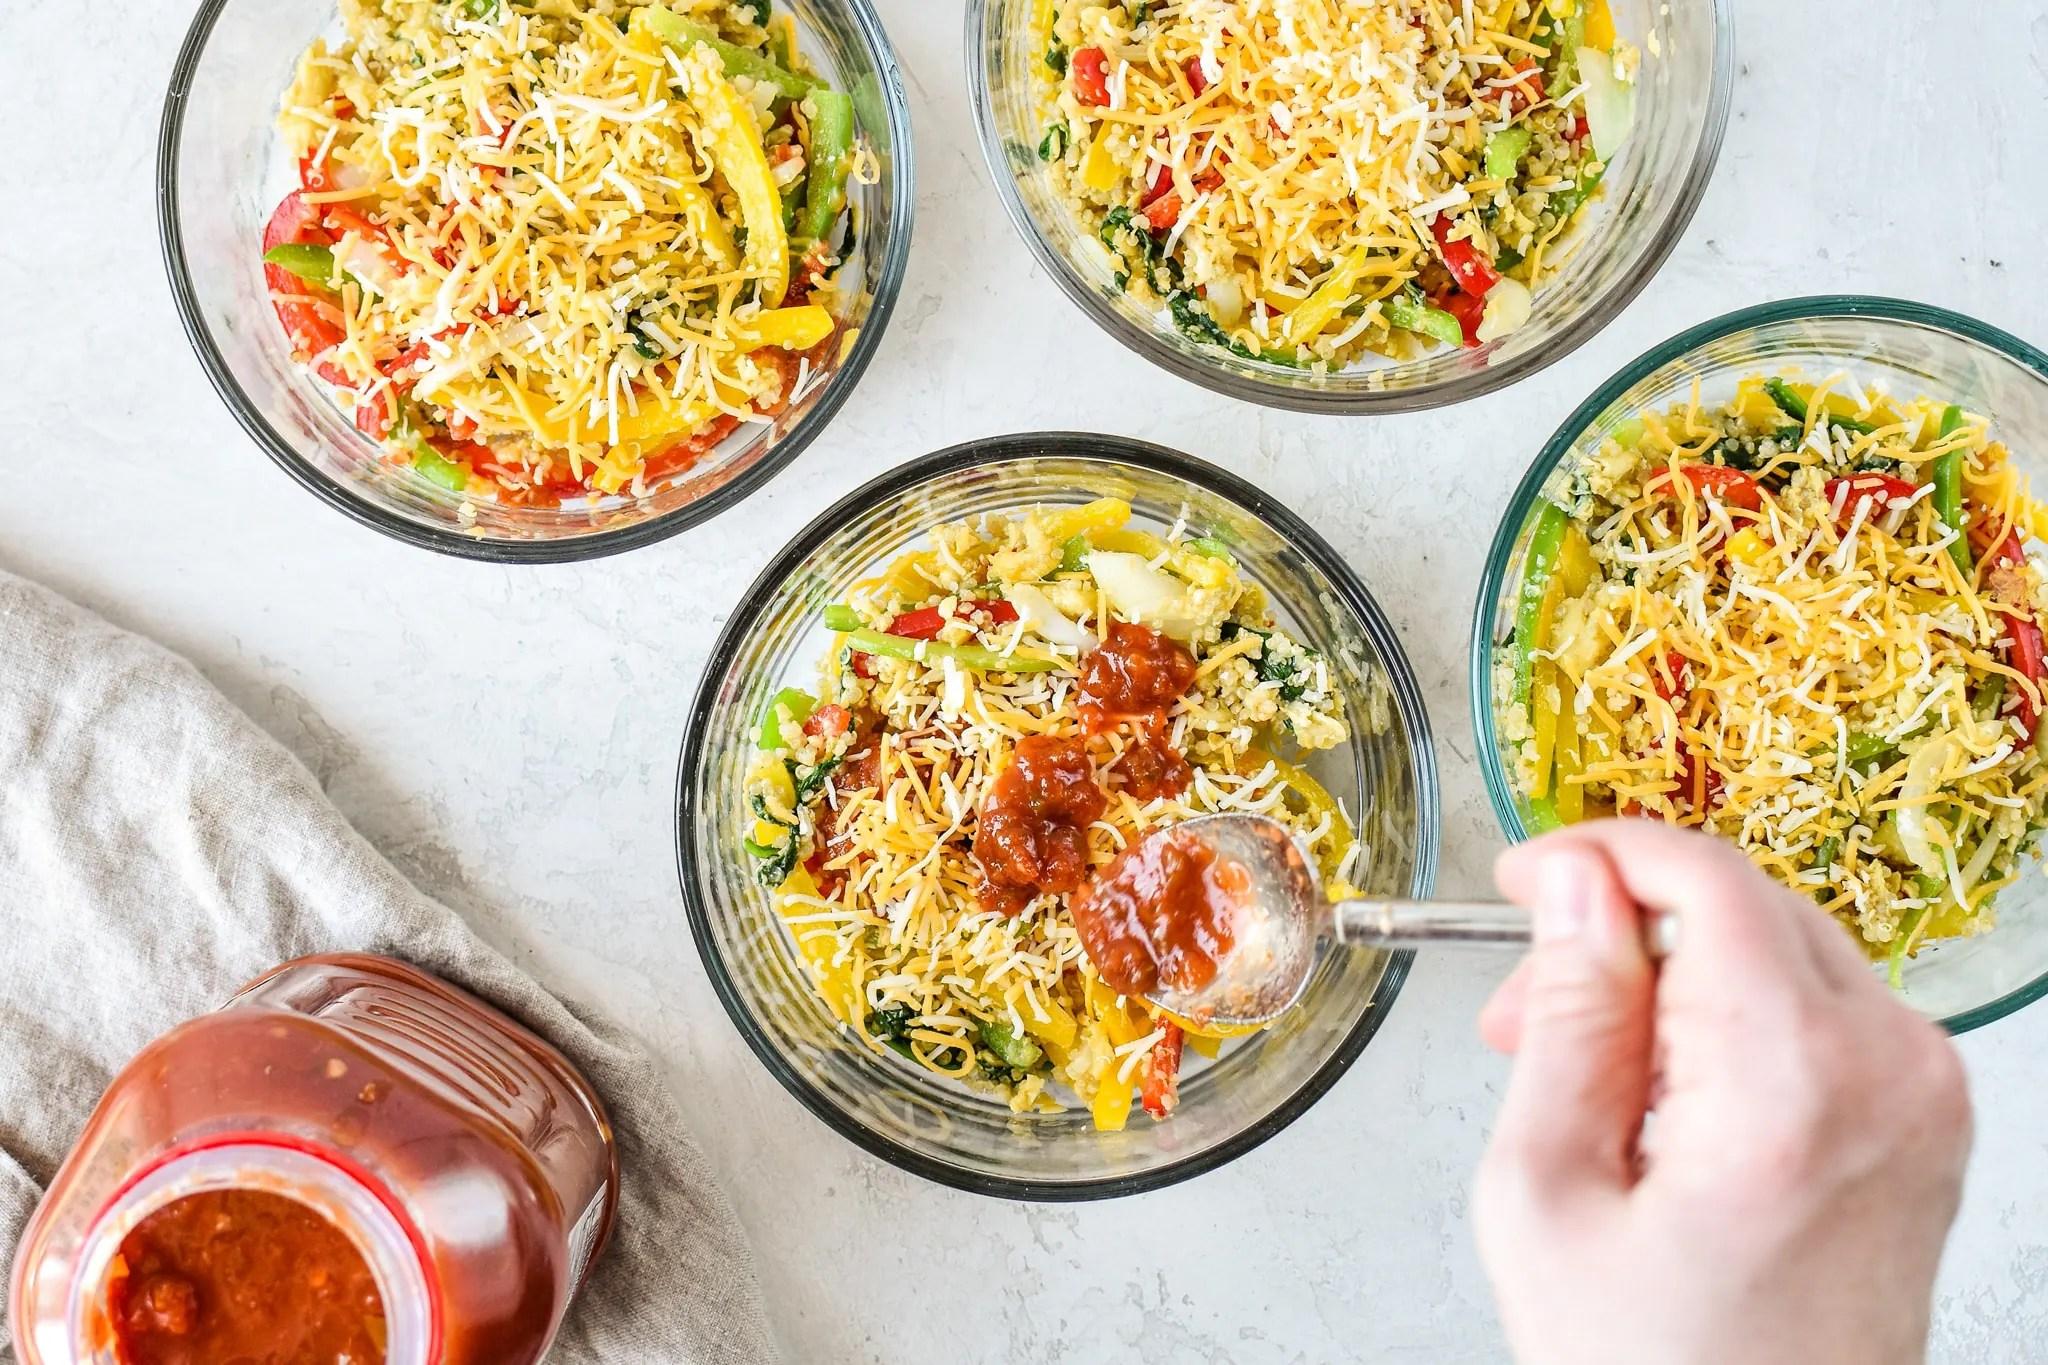 Freezer Friendly - Quinoa Egg Scramble Bowl